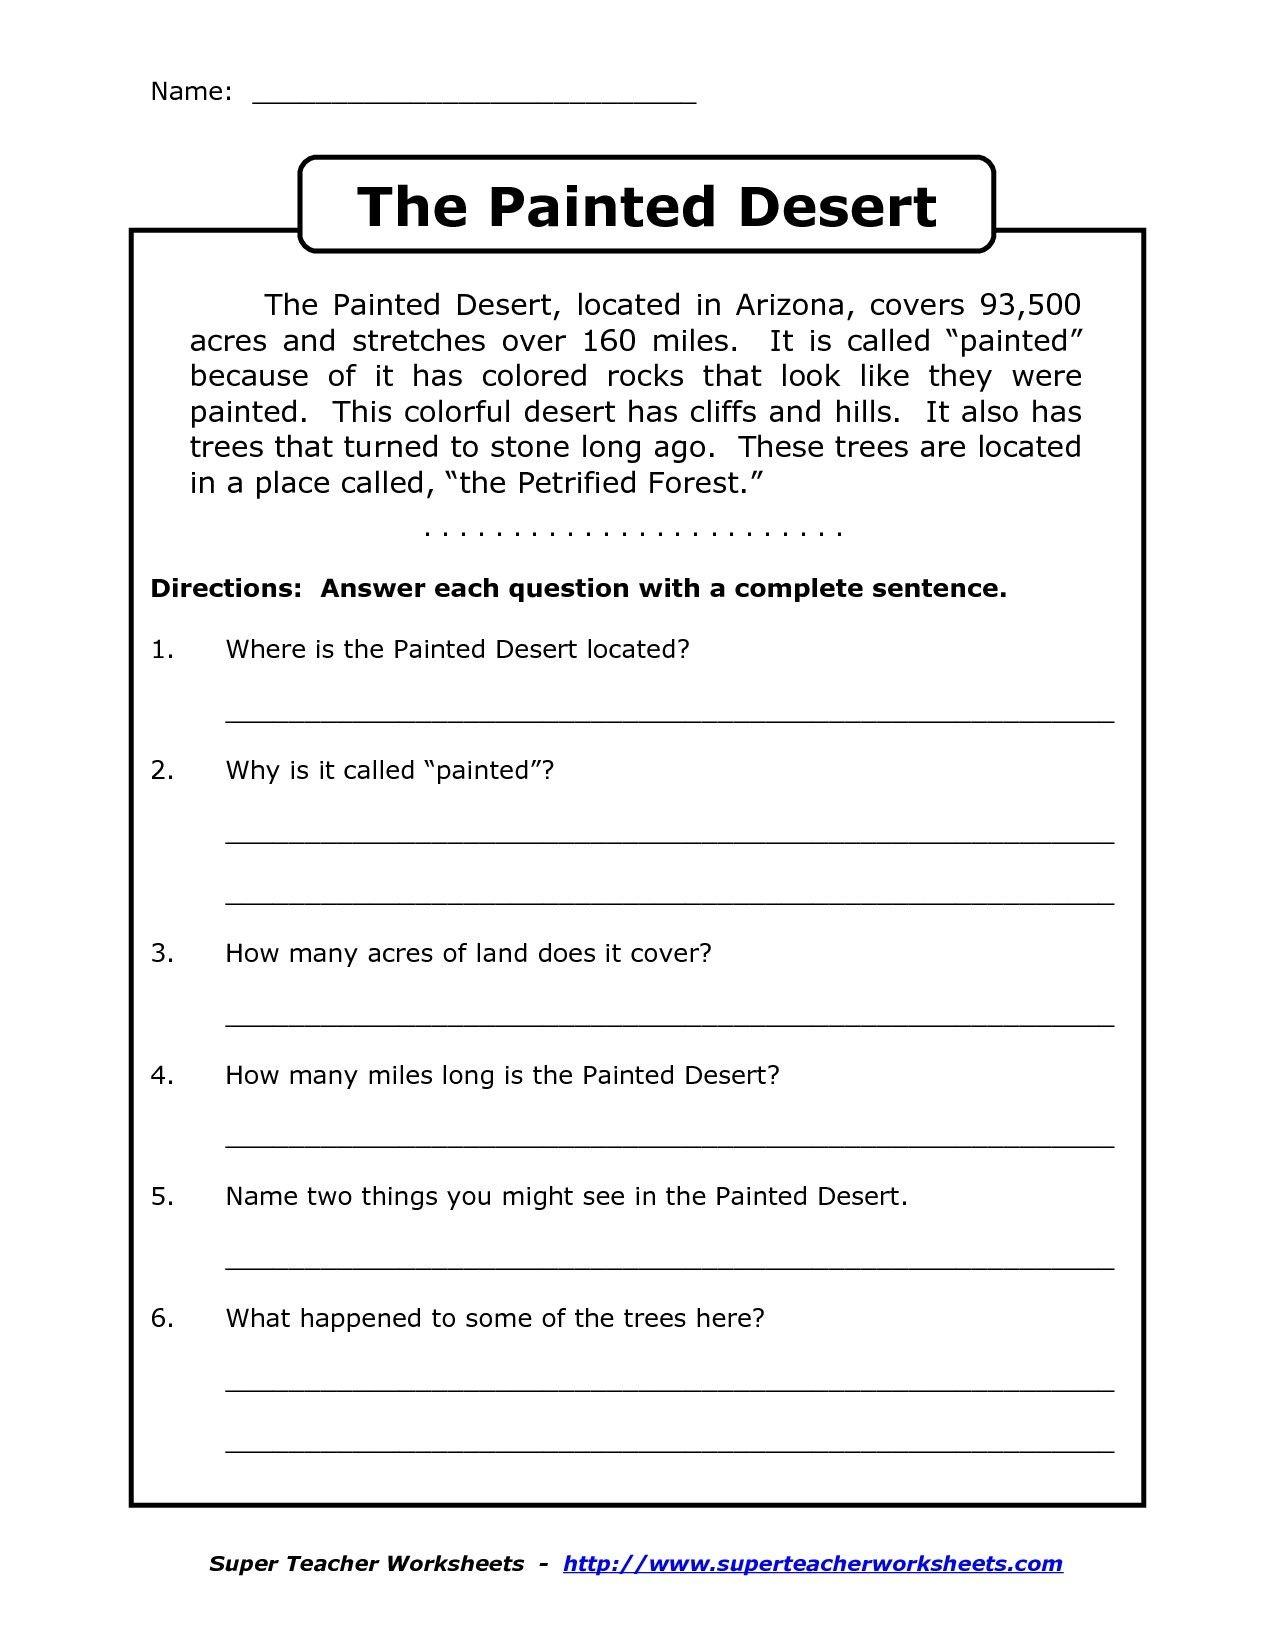 Image Result For Free Printable Worksheets For Grade 4 Comprehension - Third Grade Reading Worksheets Free Printable